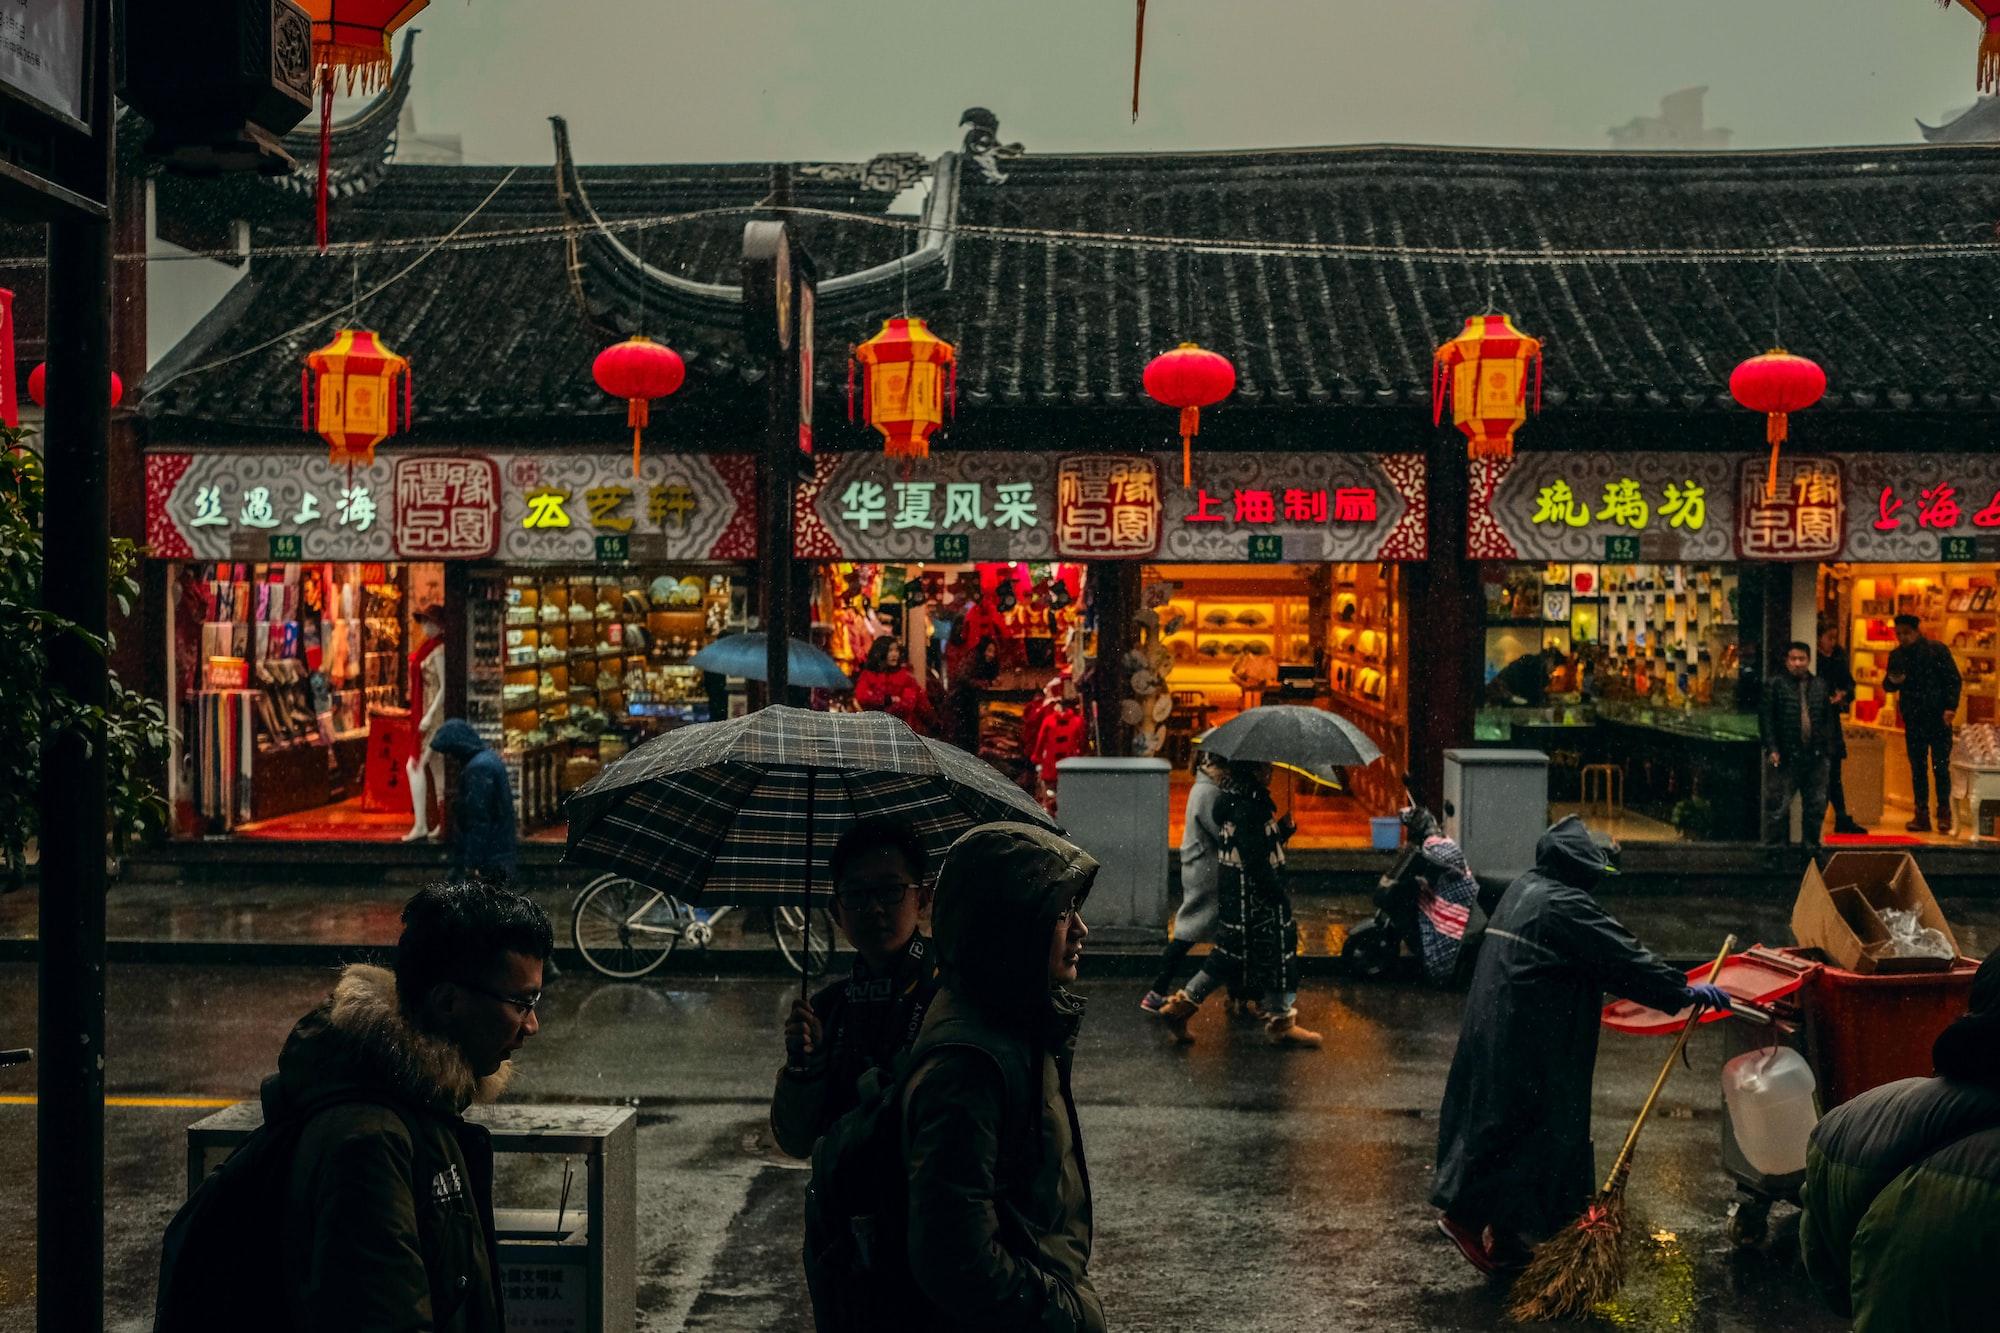 Will Digital Yuan replace U.S. Dollar?